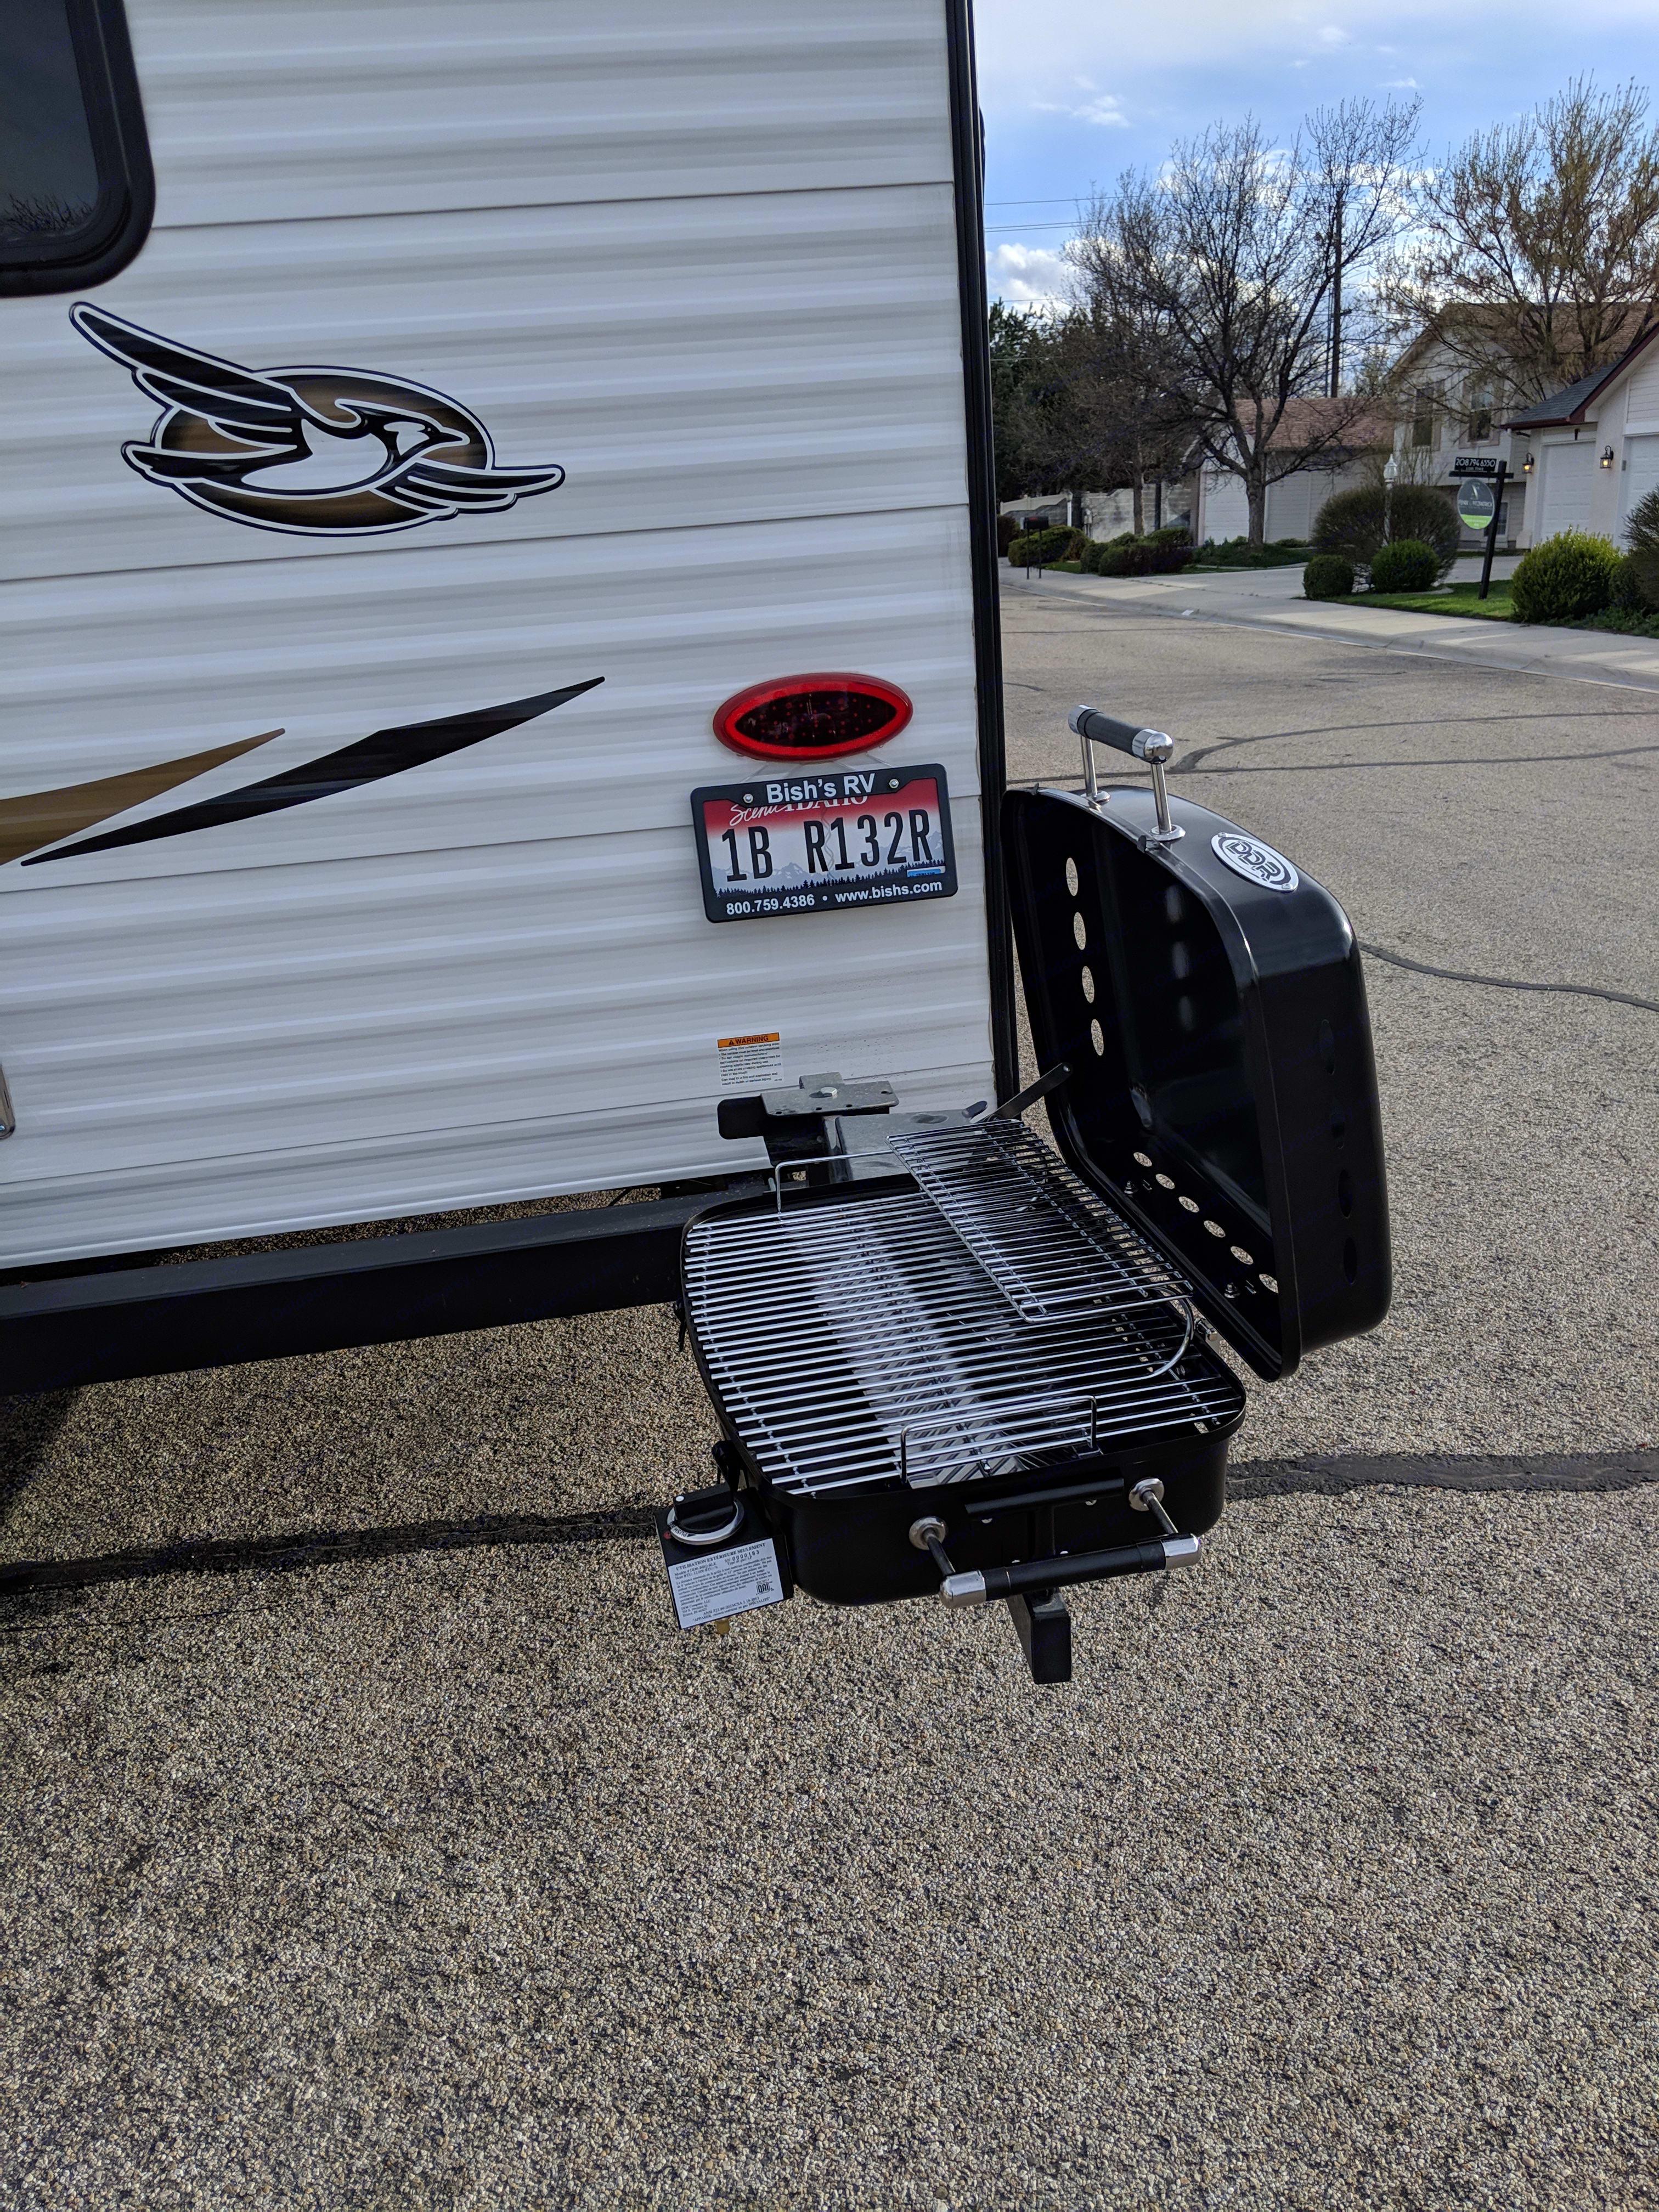 Propane grill. Jayco Jay Flight 2018